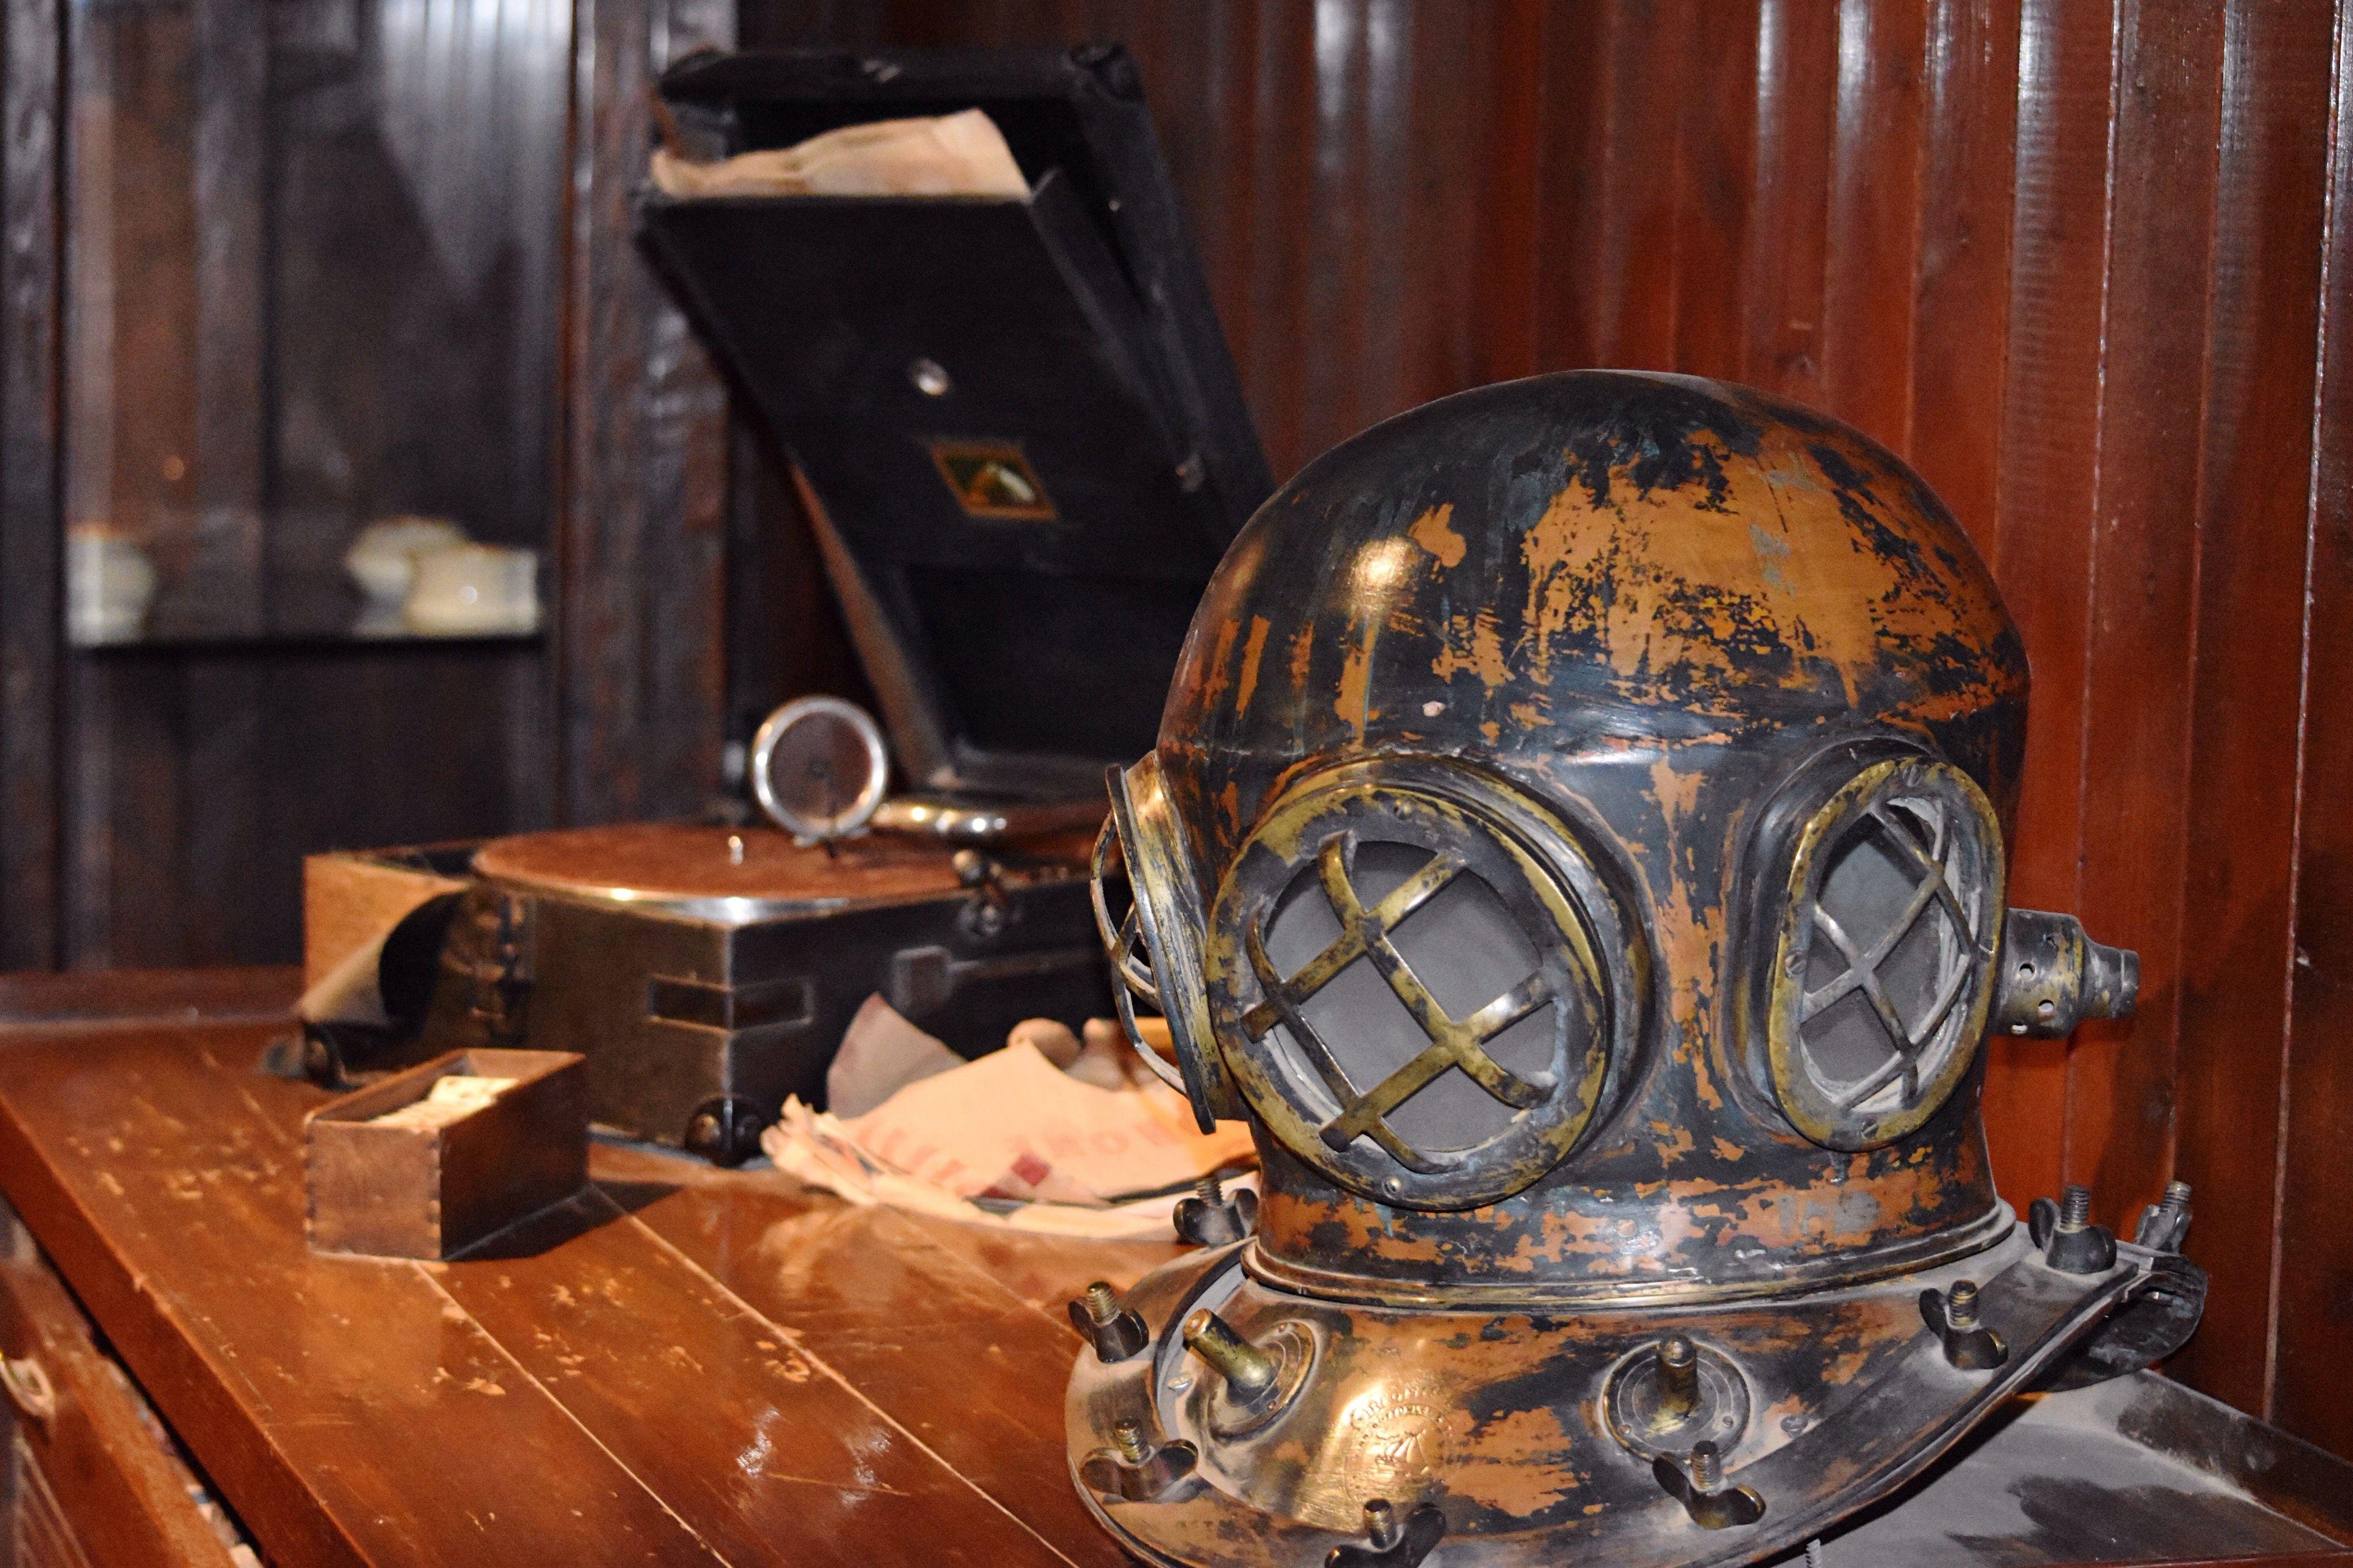 Diving helmets on desk